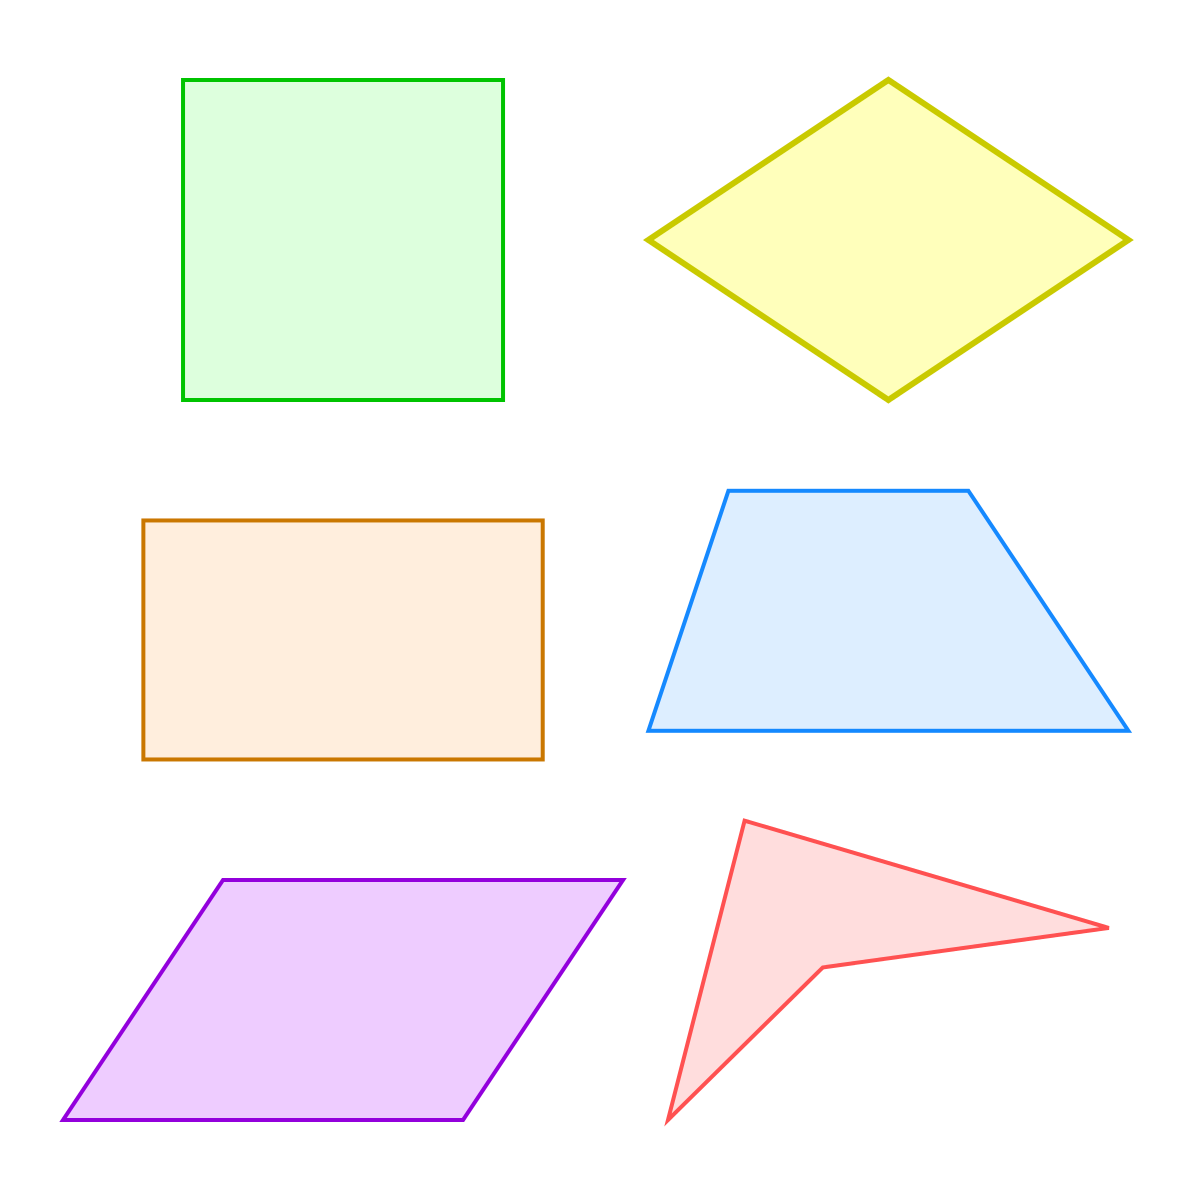 Square clipart quadrilateral shape. Shapes worksheet free printables